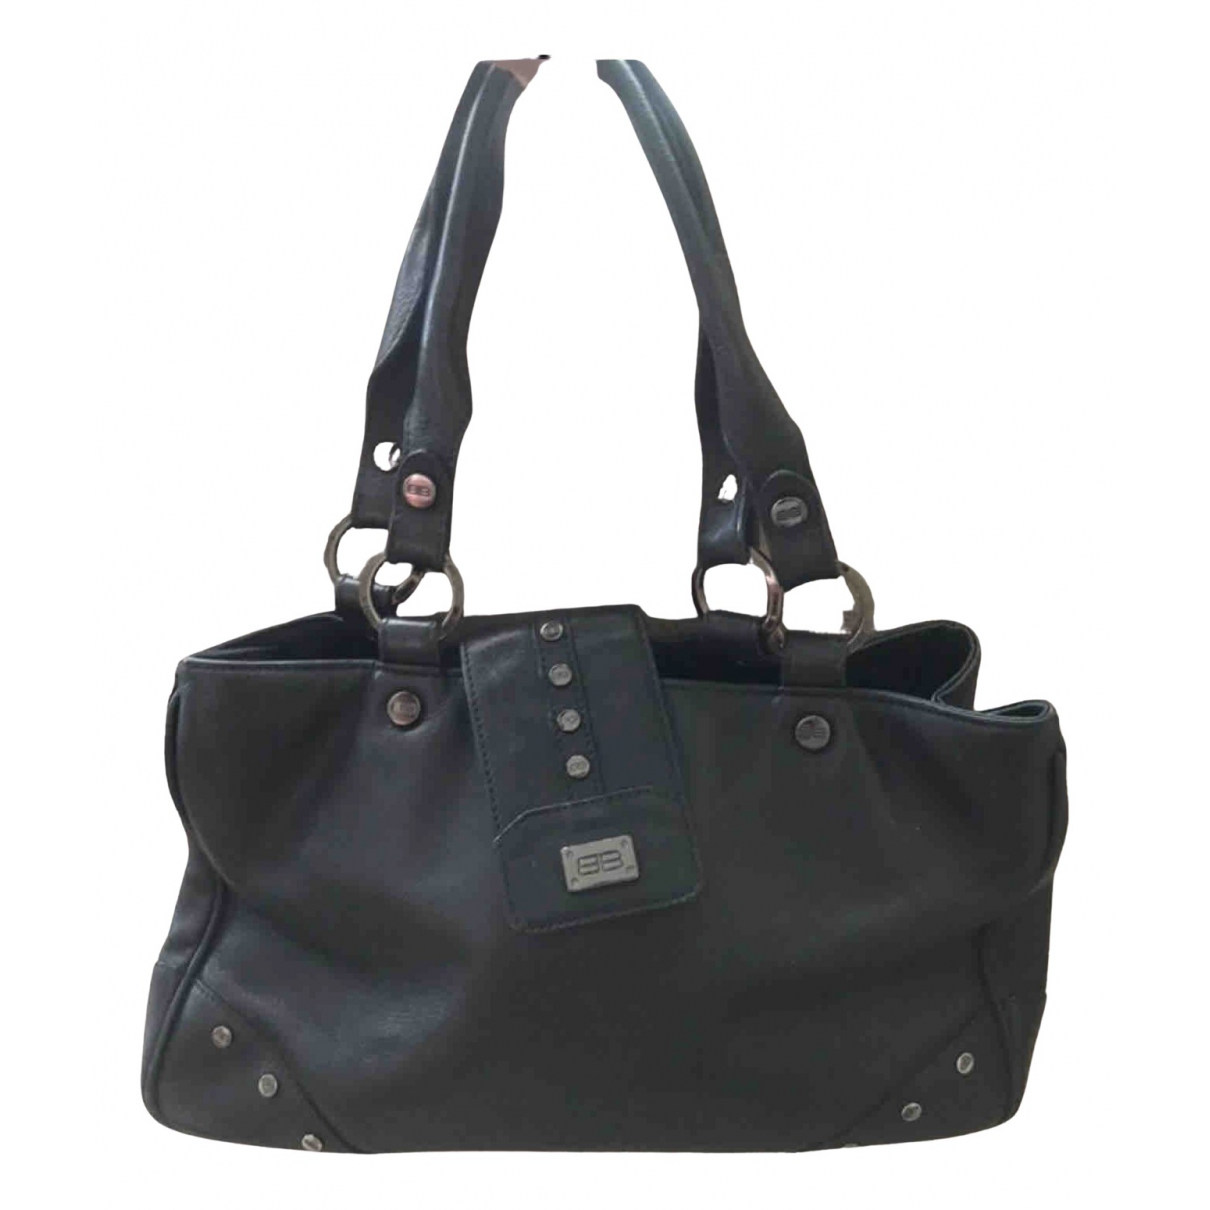 Balenciaga \N Handtasche in  Schwarz Fell